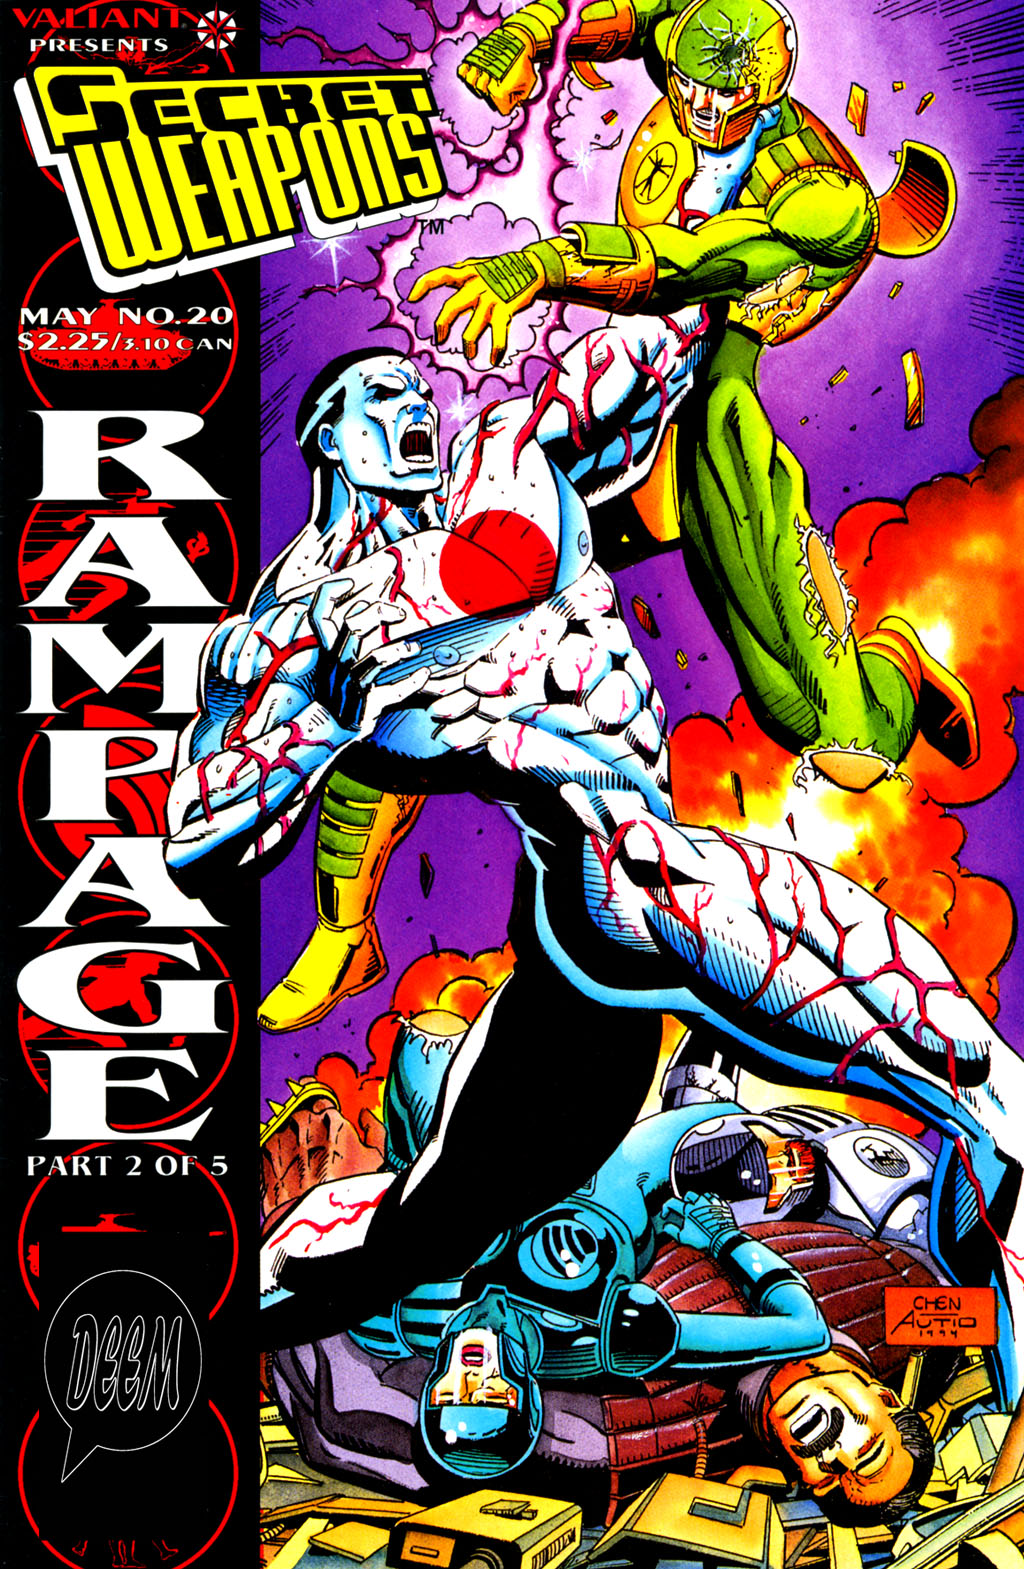 Read online Secret Weapons comic -  Issue #20 - 1